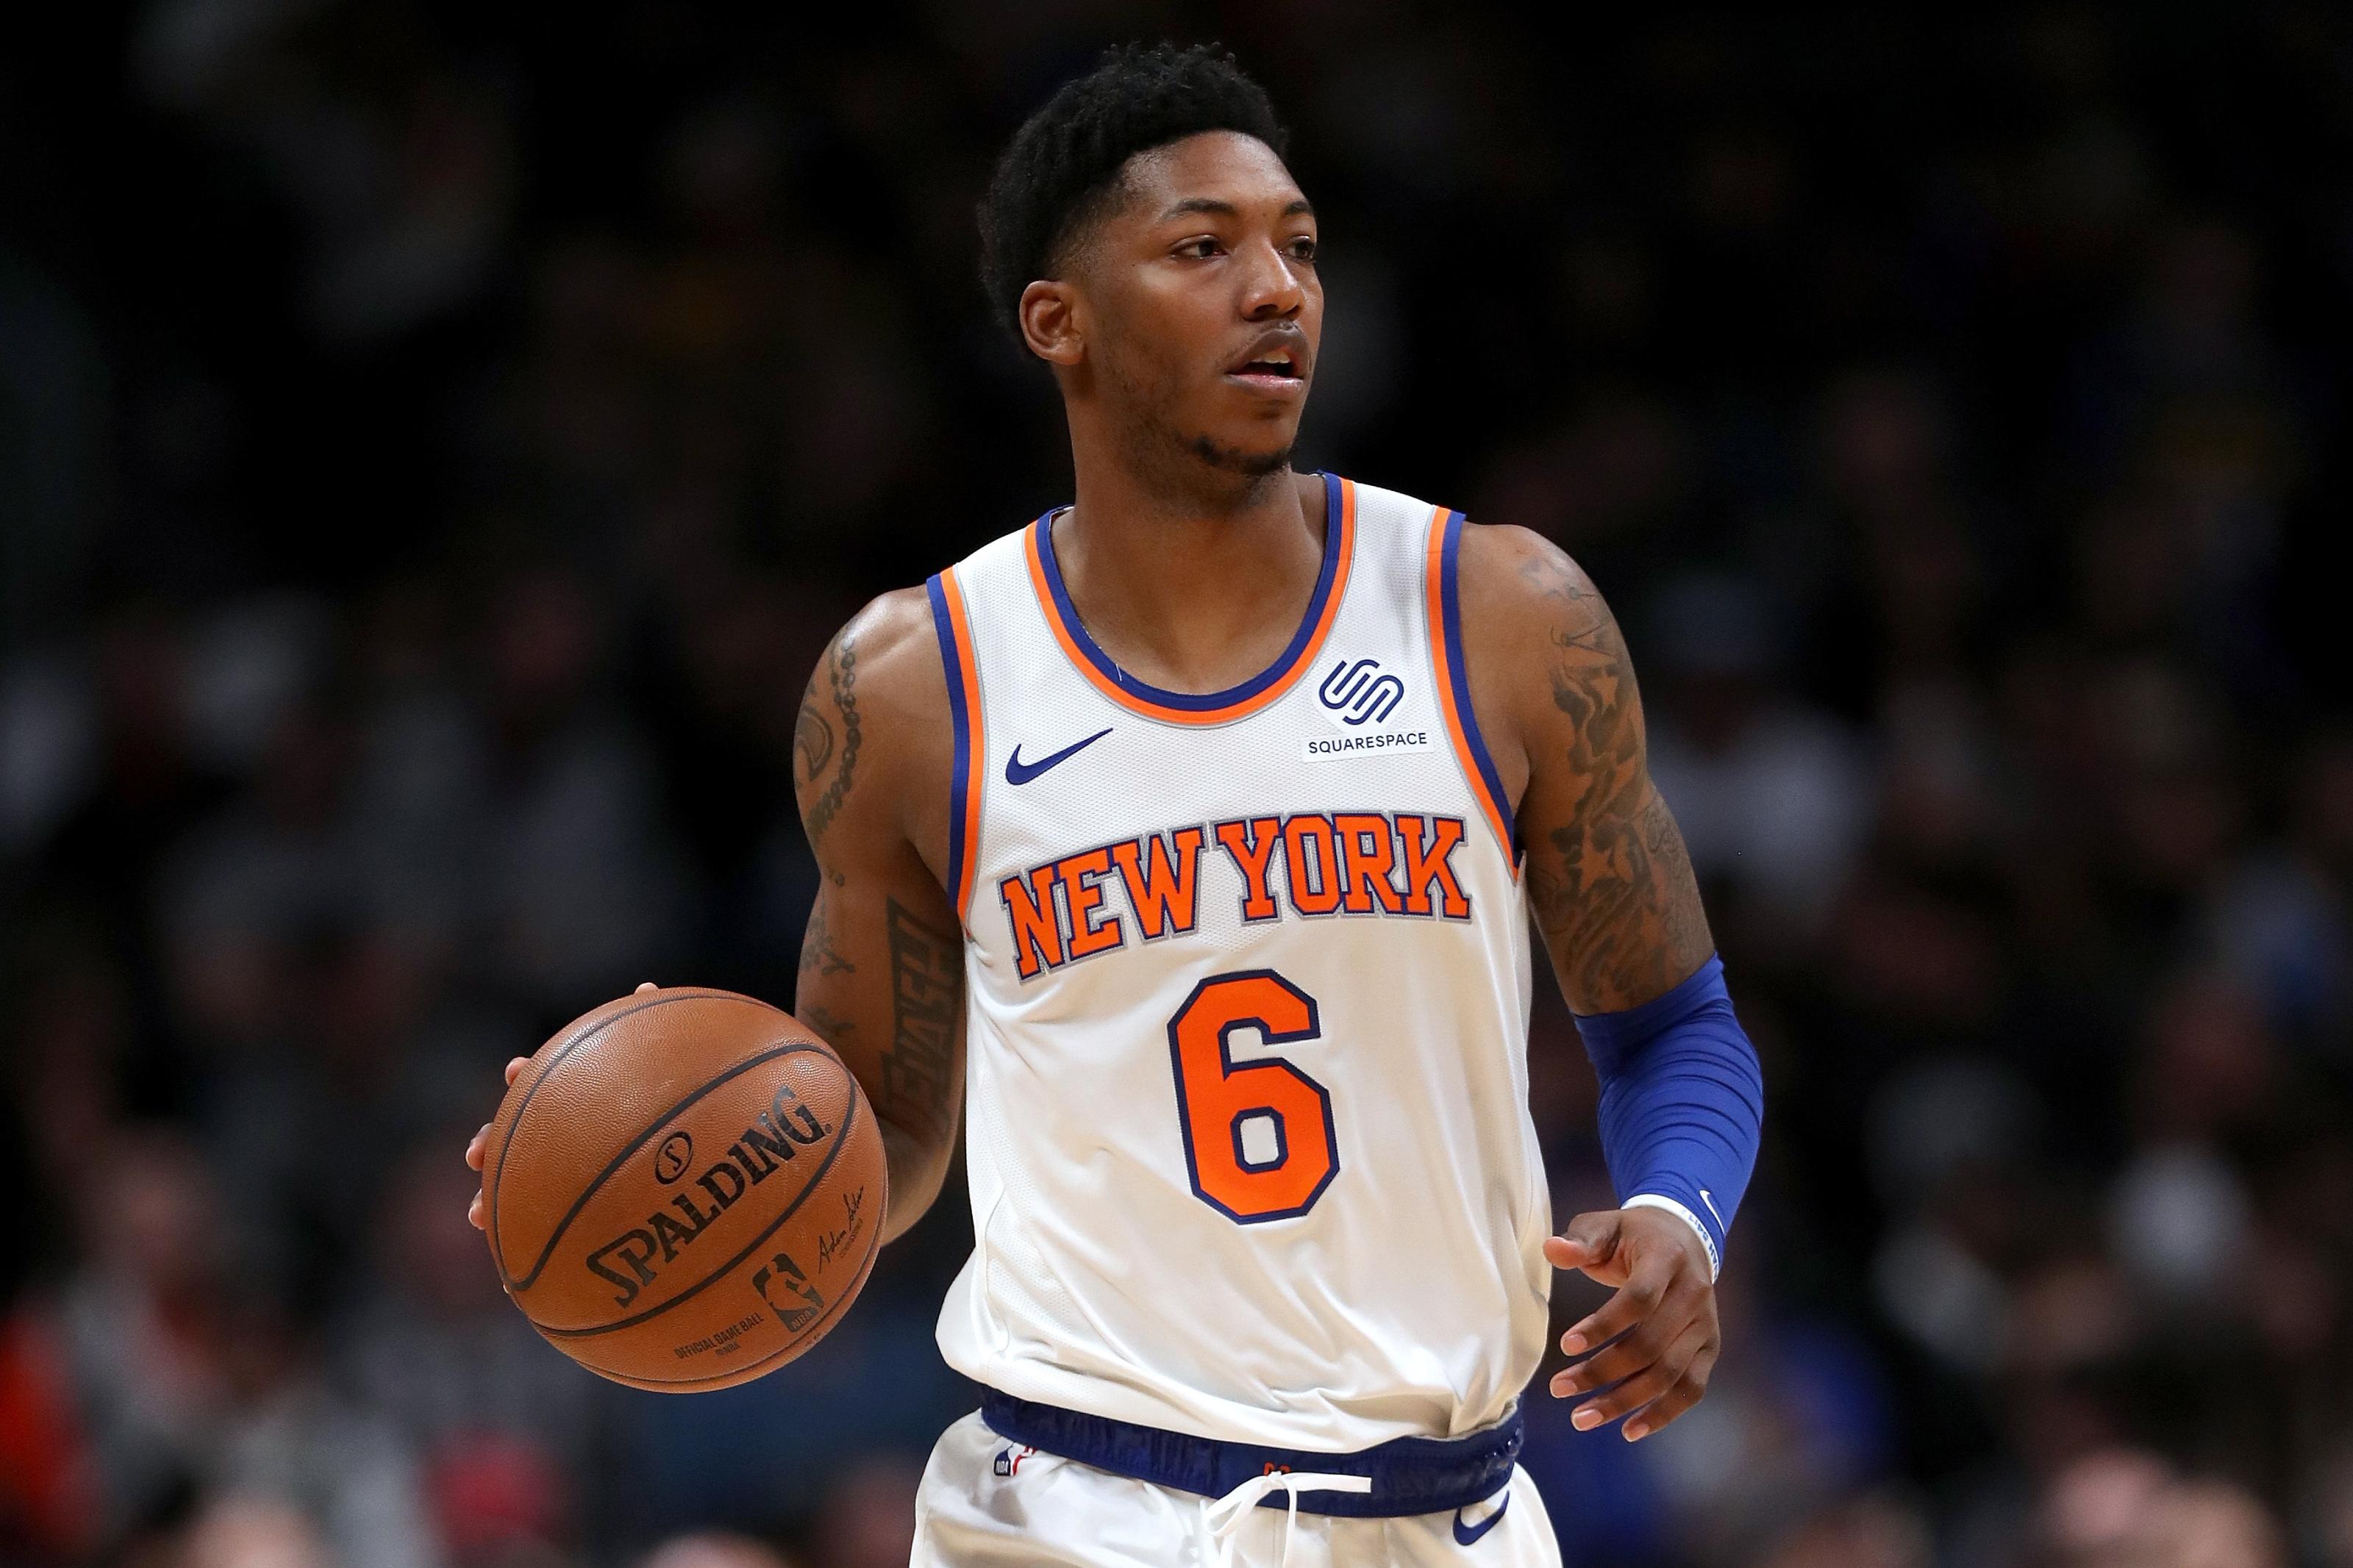 New York Knicks: Elfrid Payton has had a positive impact on the team